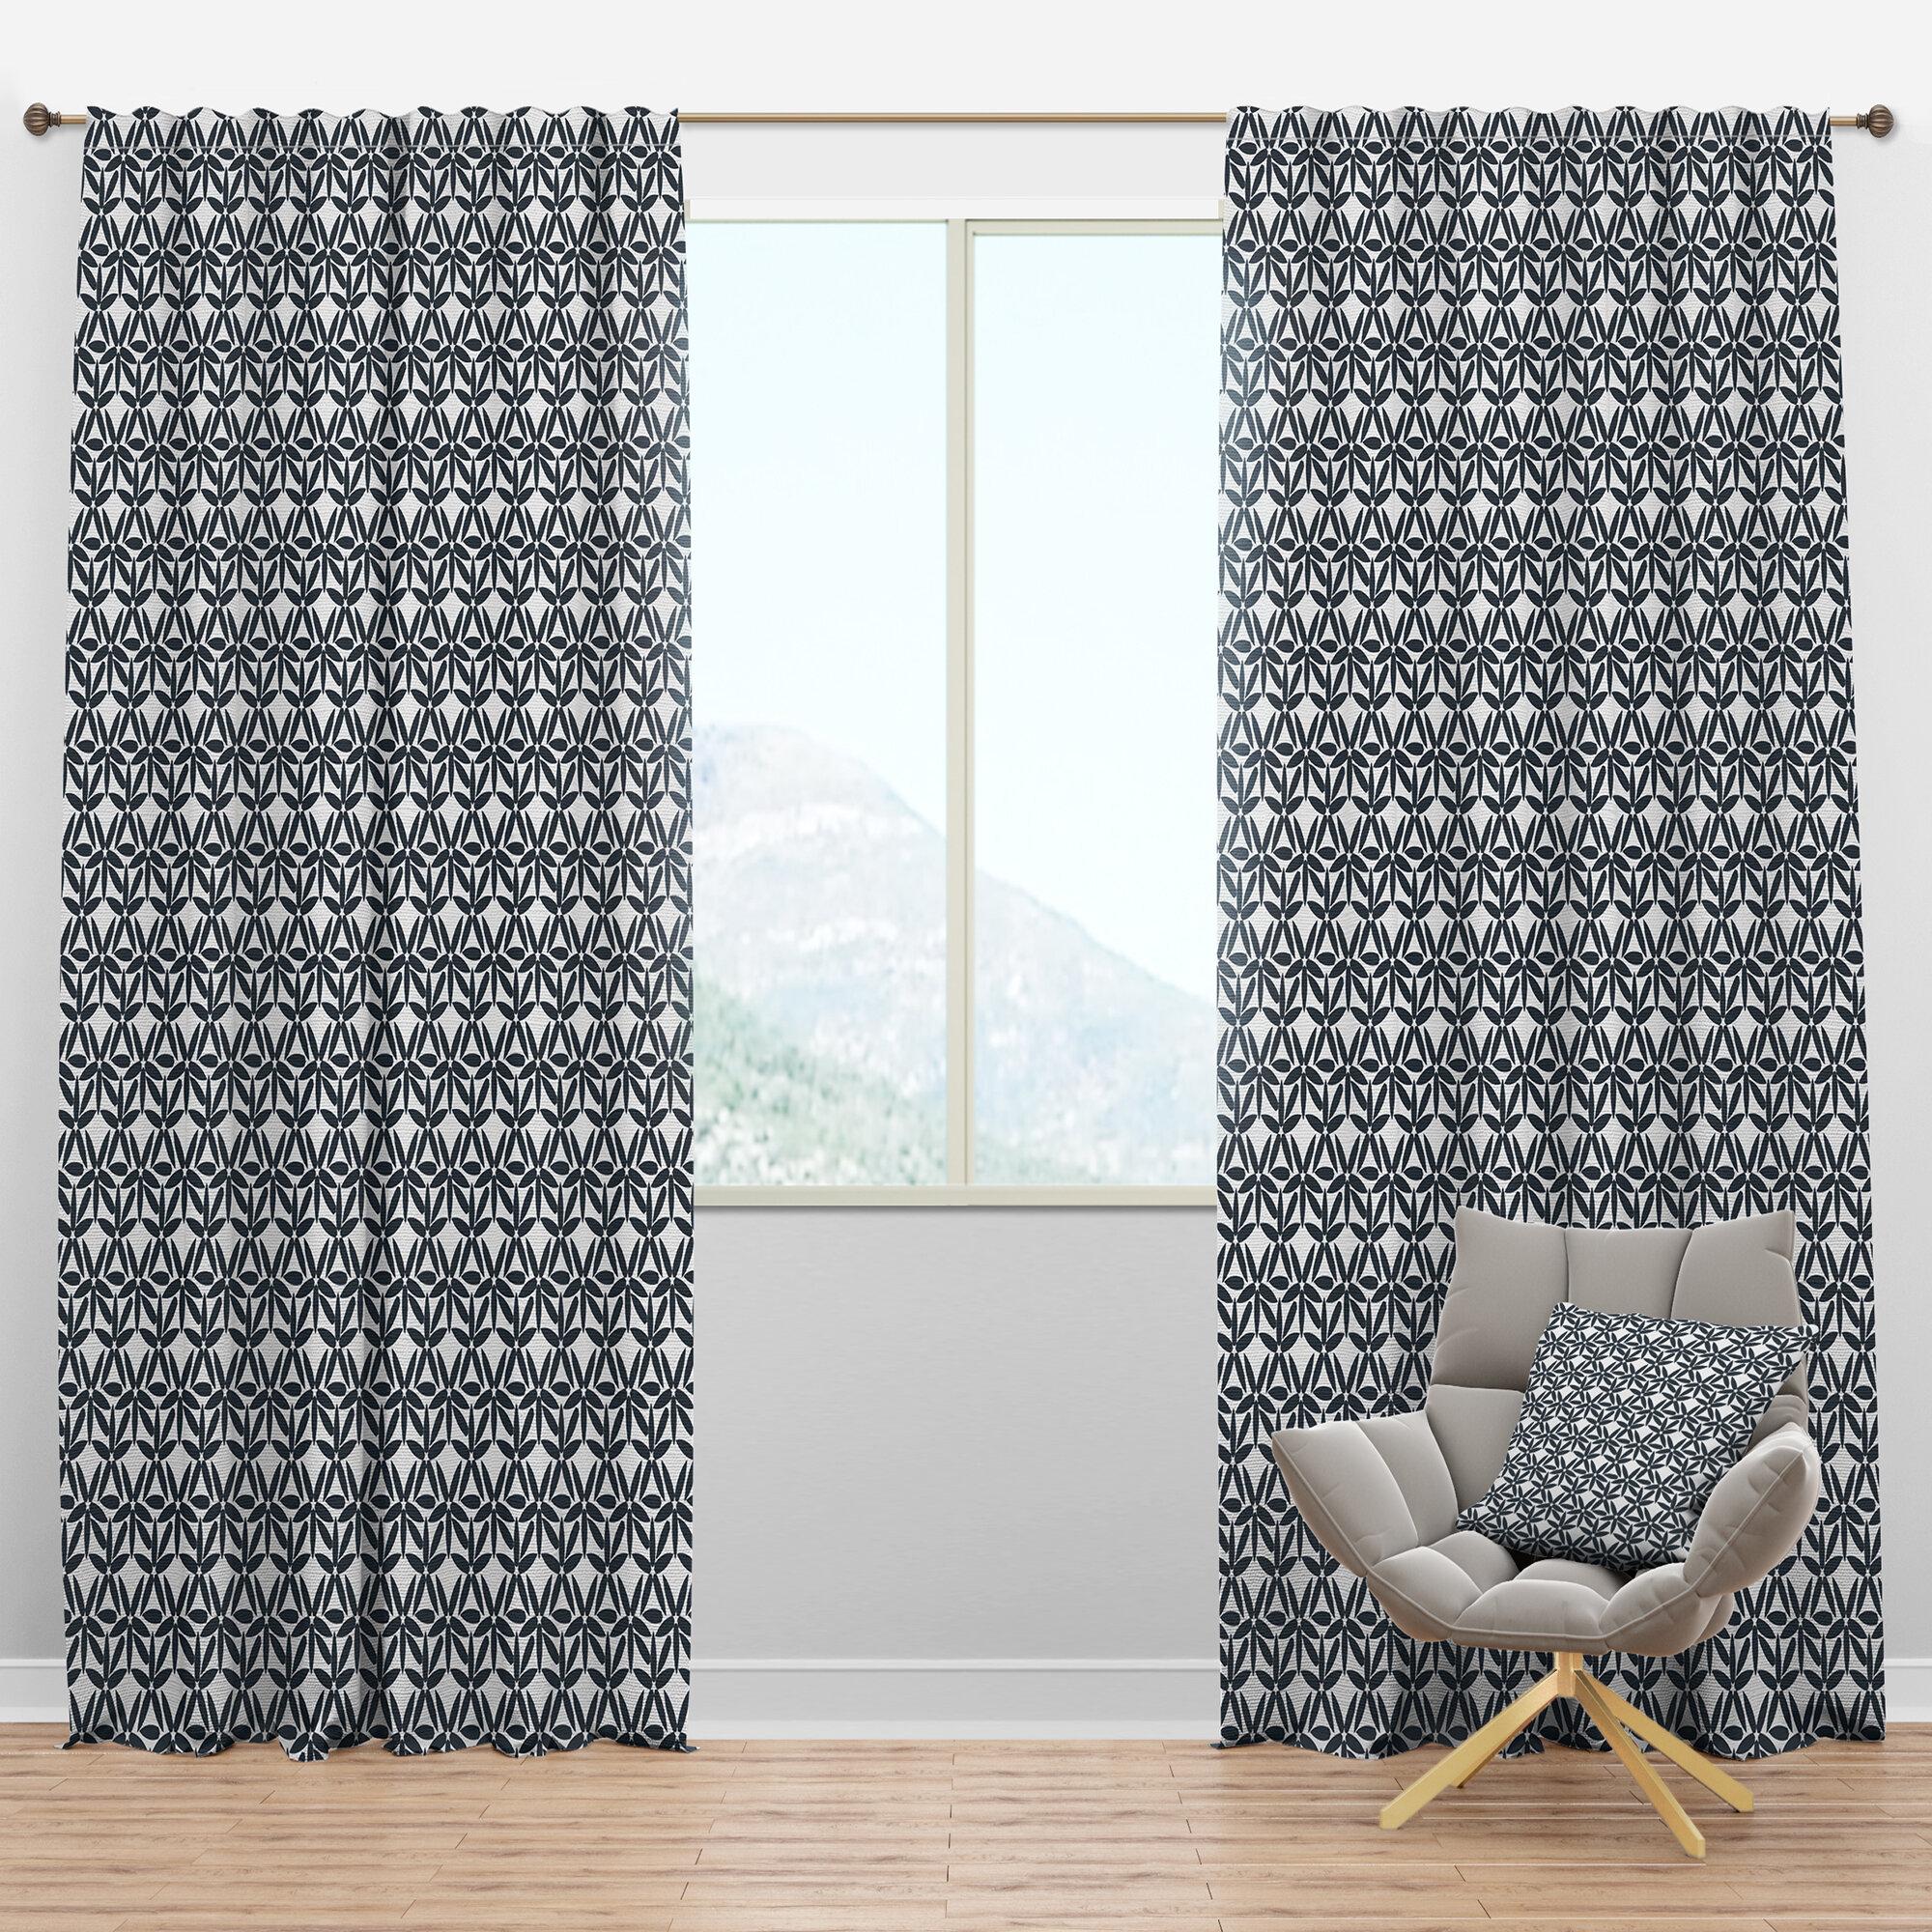 East Urban Home Mid Century Design Iv Floral Semi Sheer Thermal Rod Pocket Curtain Panels Wayfair